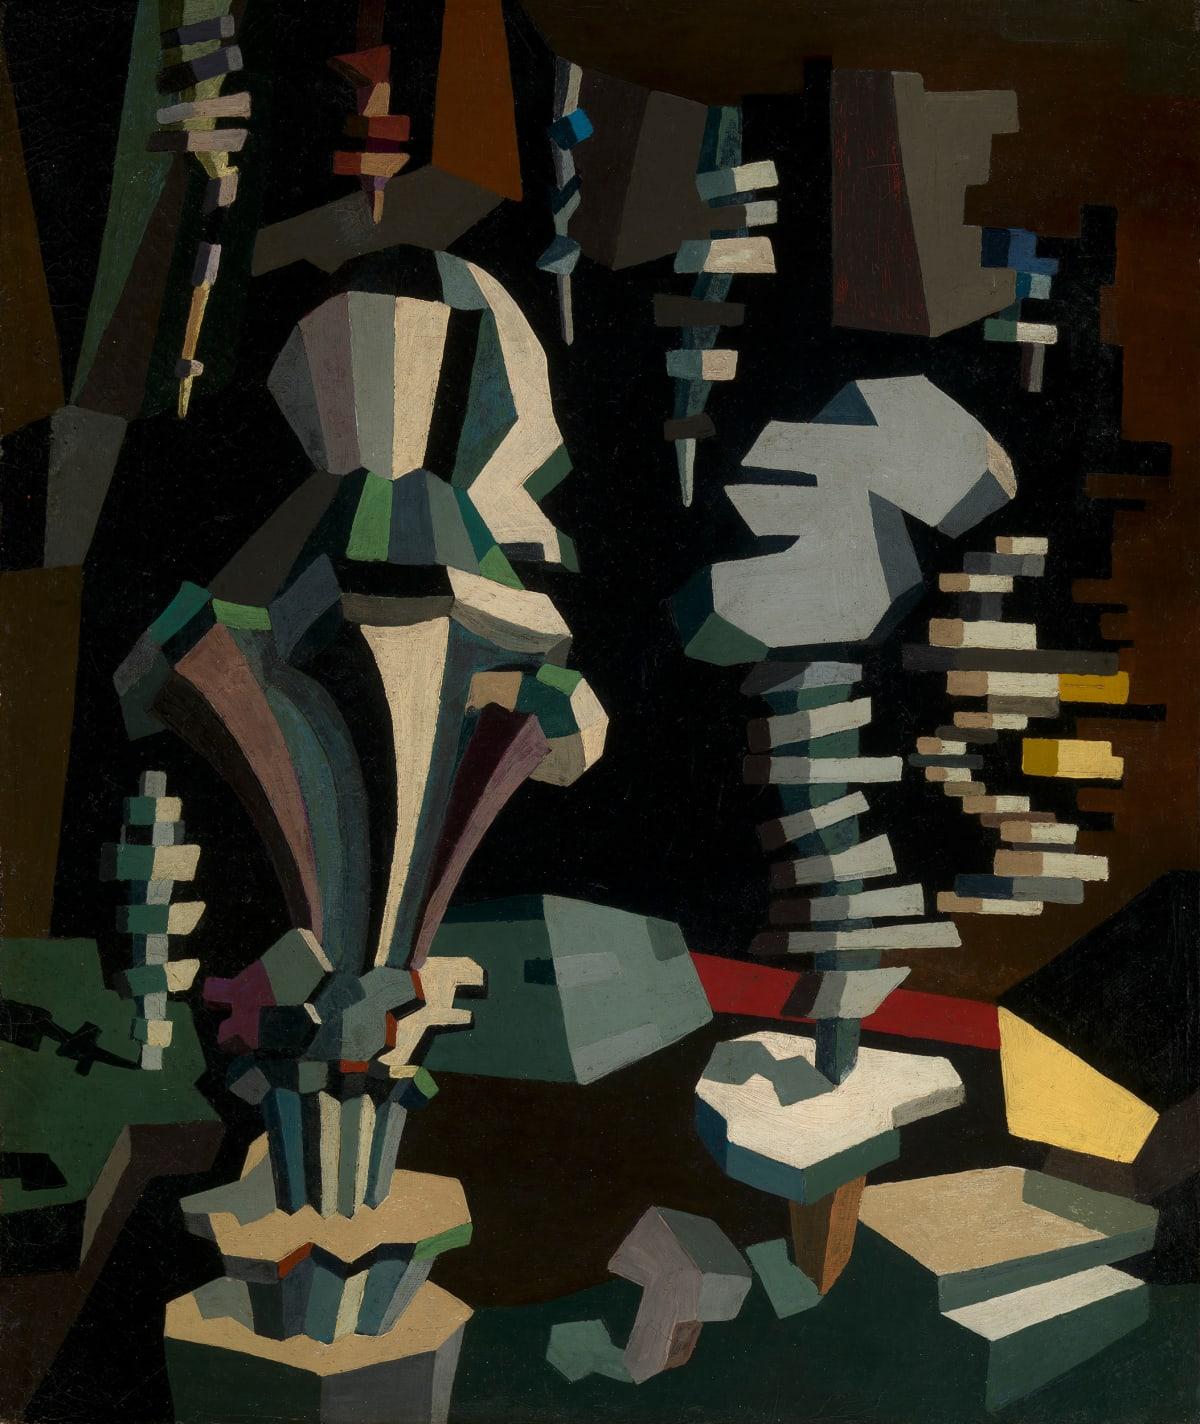 Angel Zarraga, Composition cubiste, Circa 1913-1915